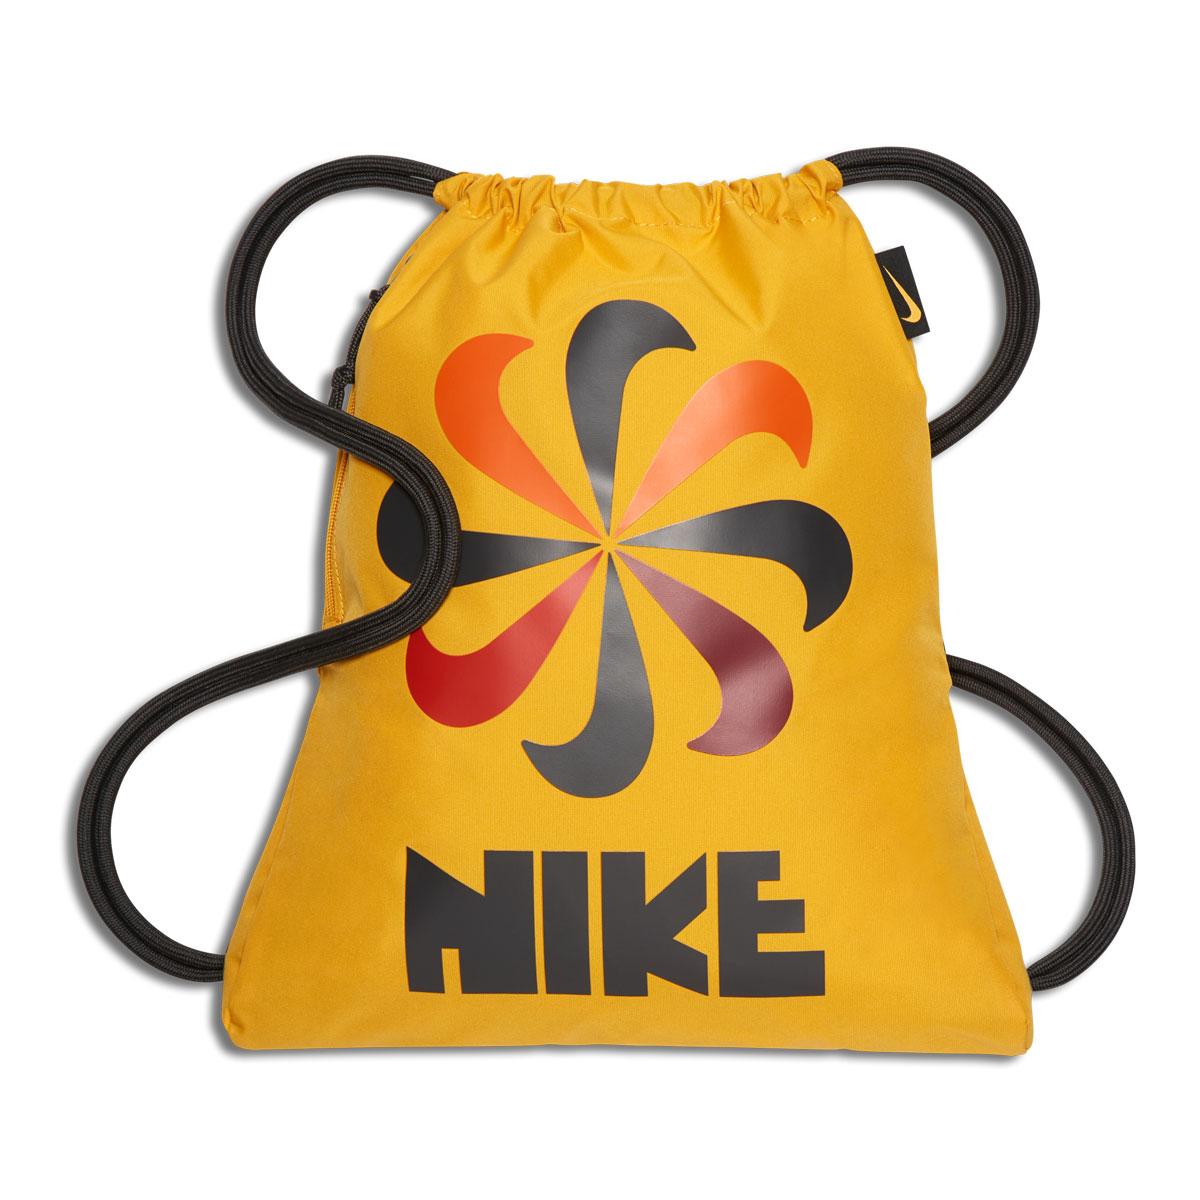 NIKE NK HERITAGE GMSK 3 - GFX (Nike heritage GFX gym case 3) YELLOW  OCHRE DARK CHARCOAL YELLOW OCHRE 18FA-I c0f69c594d302